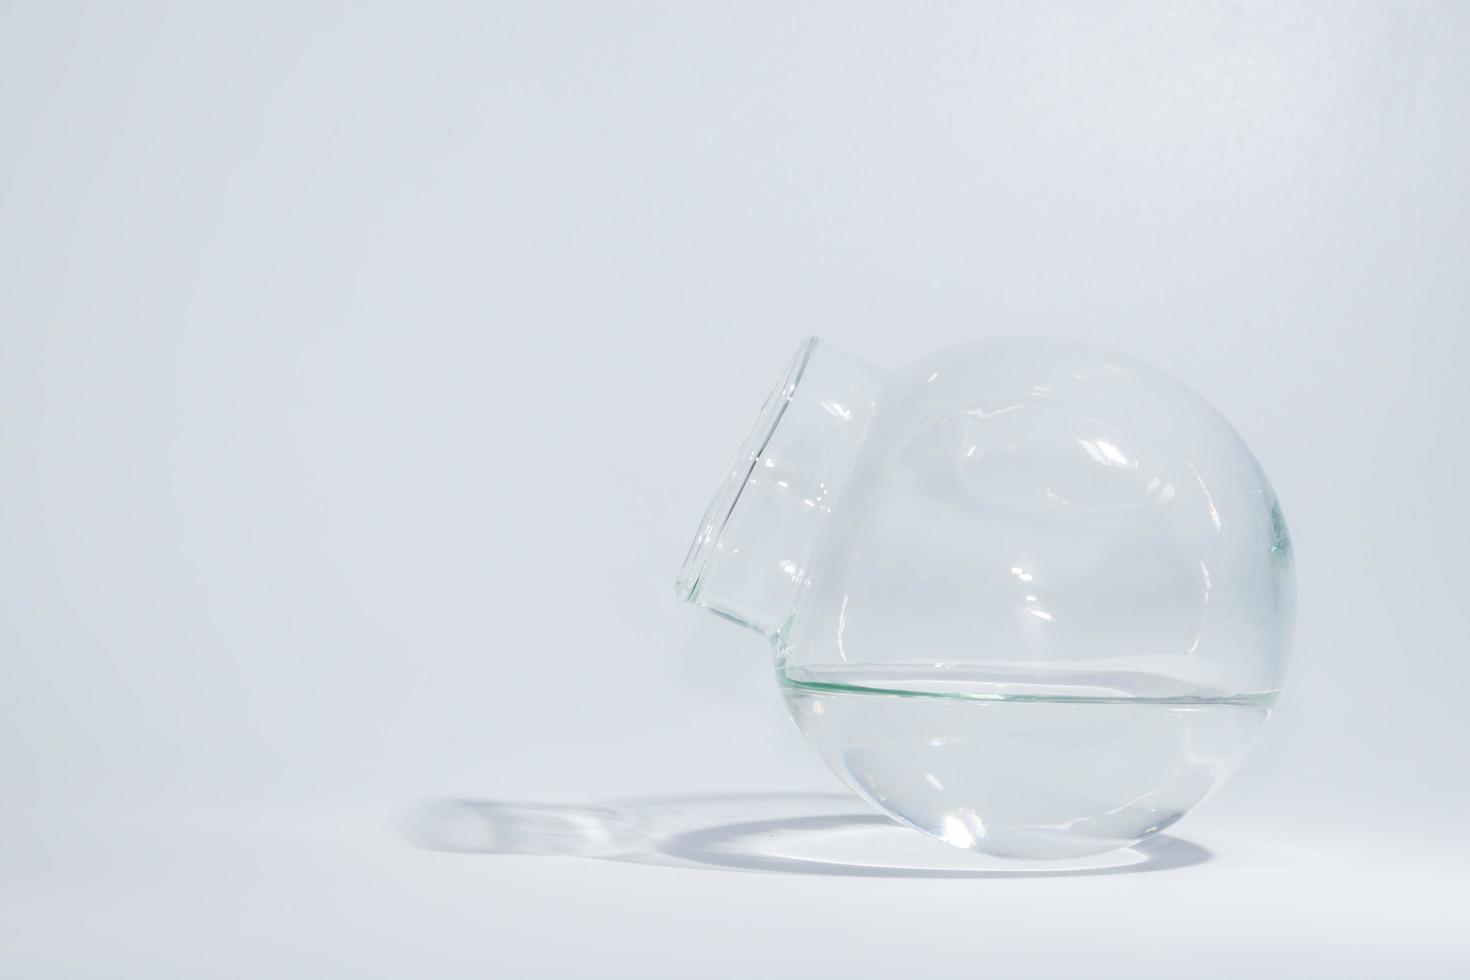 Globular jar filled with water inside photo